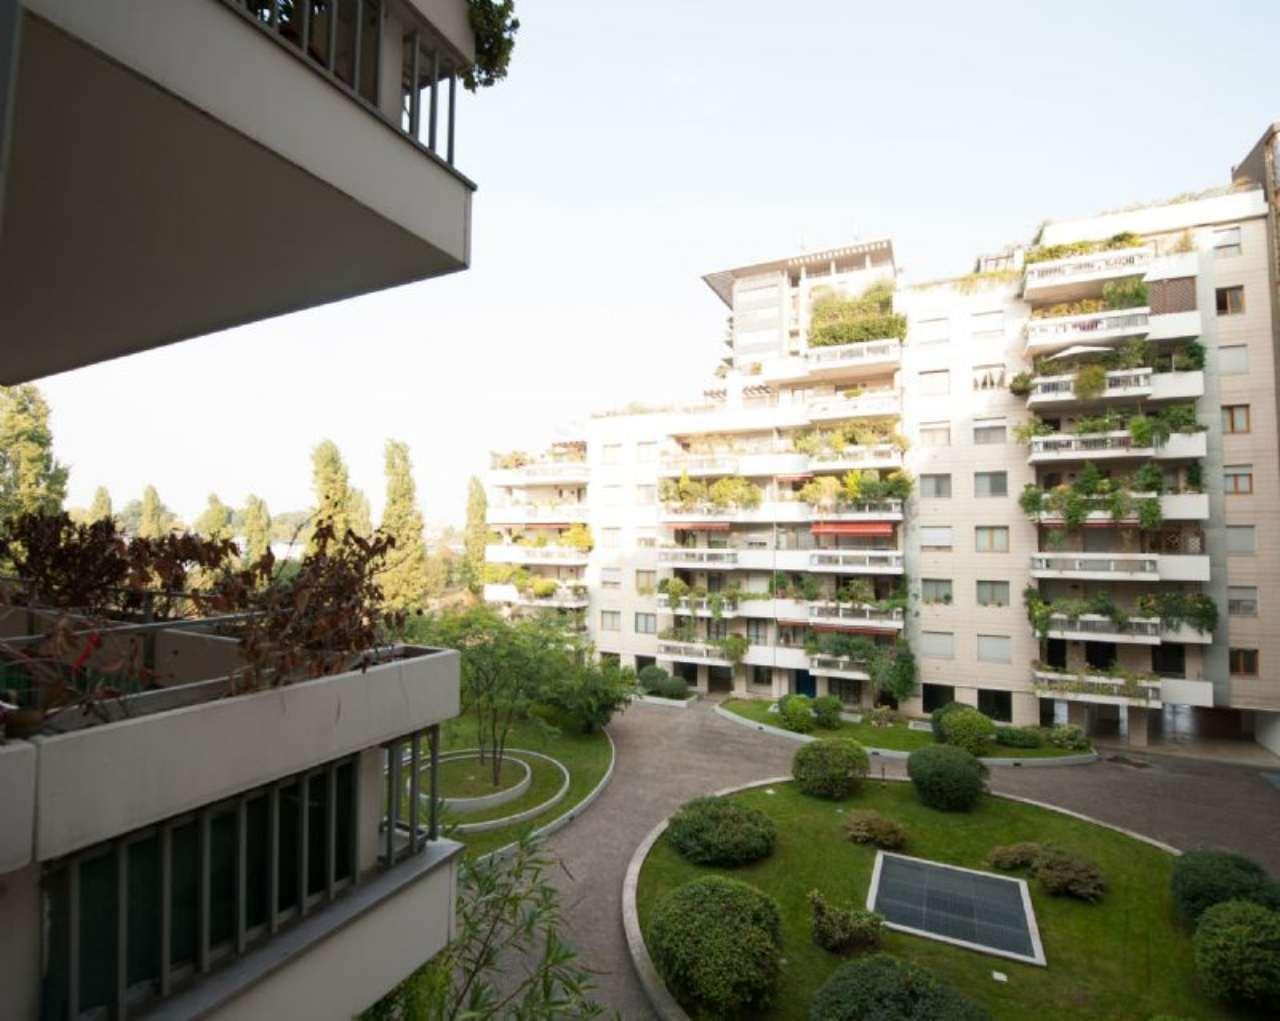 Bilocale Milano Via Spadolini 7